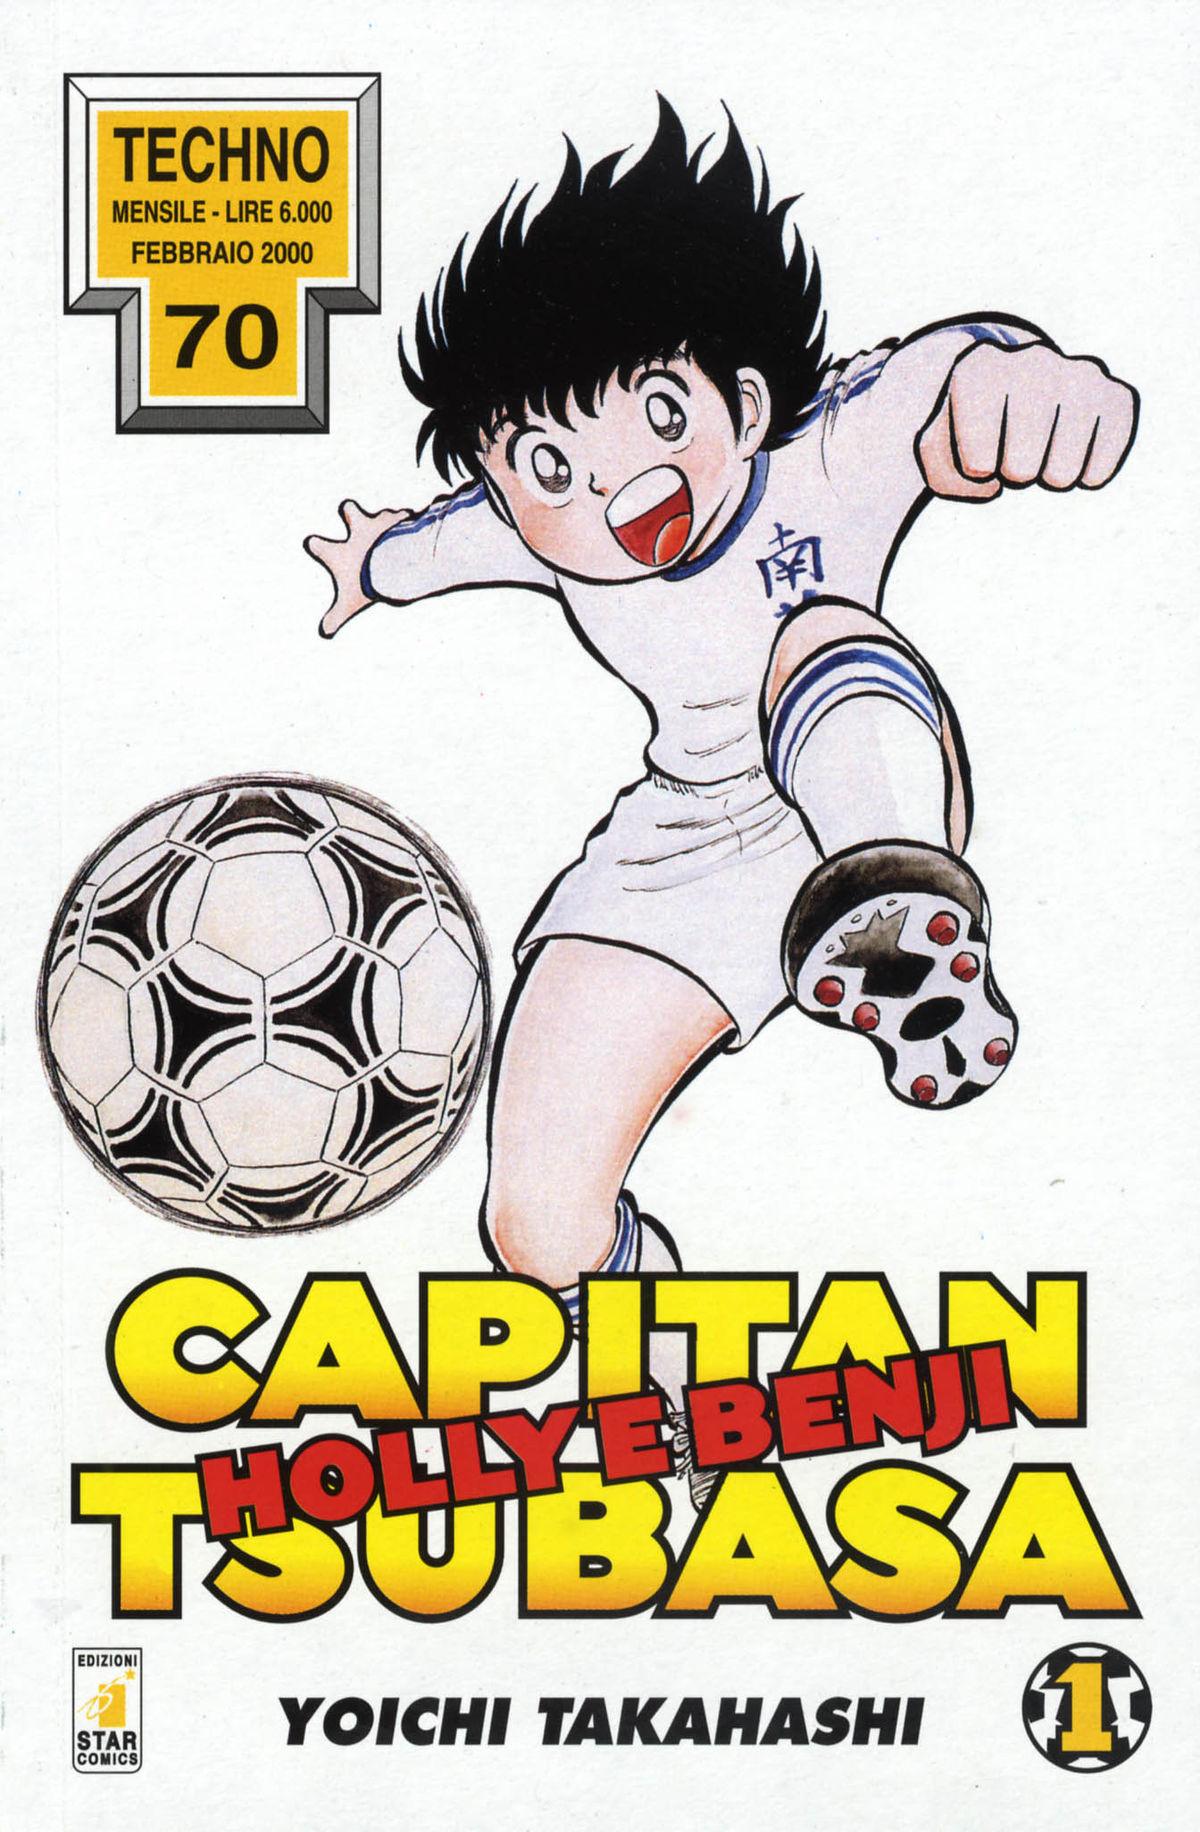 83e71de0b0 Capitan Tsubasa - Wikipedia